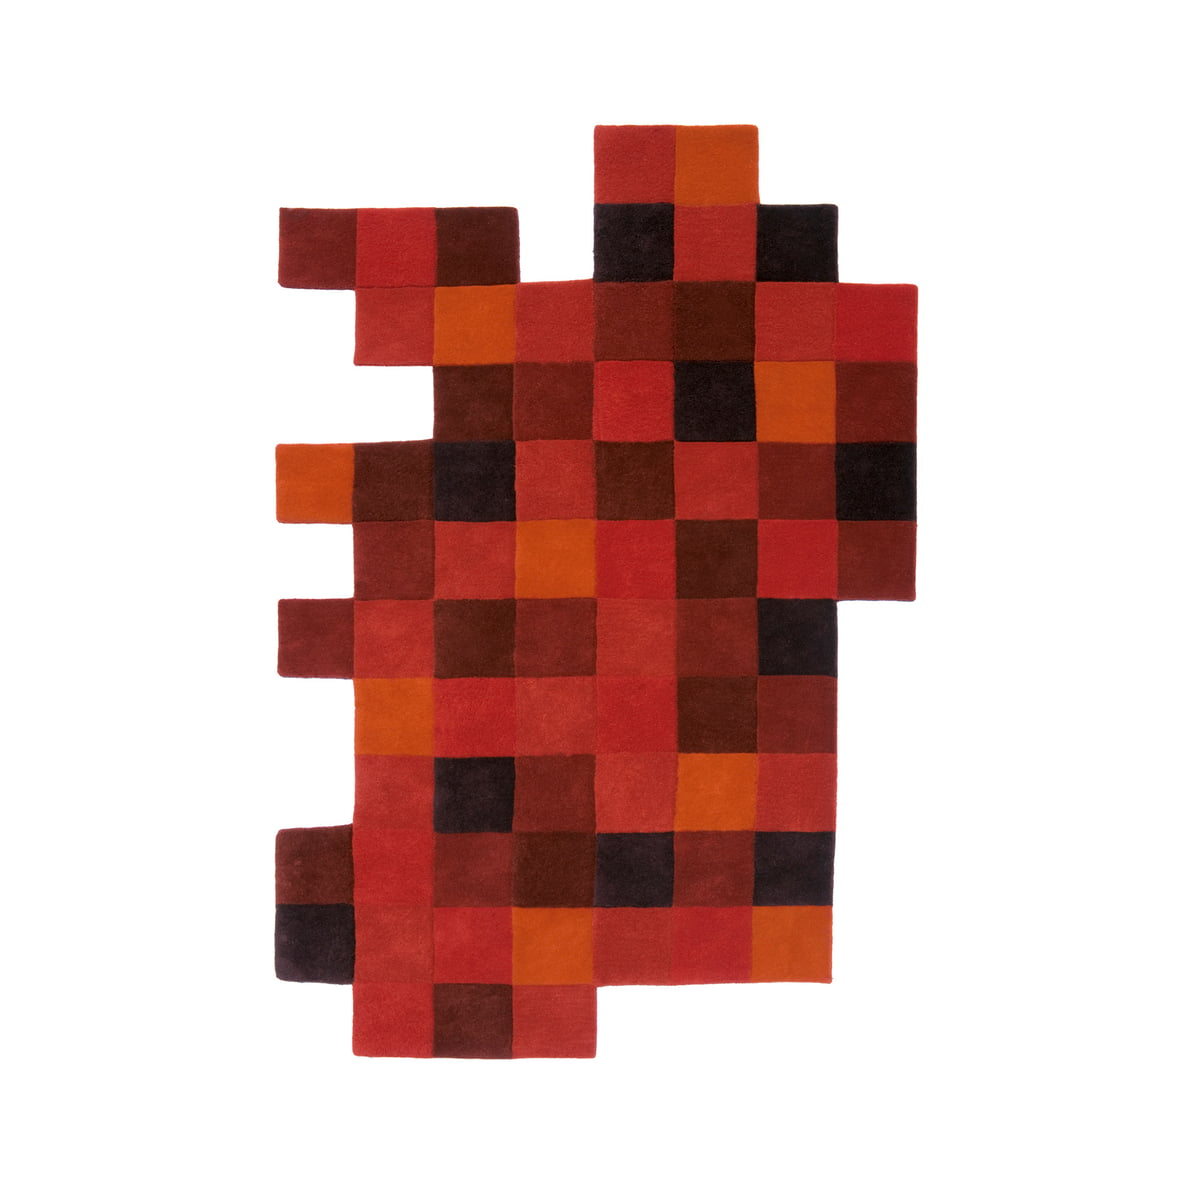 Nanimarquina do lo rez 1 184x276 cm rot